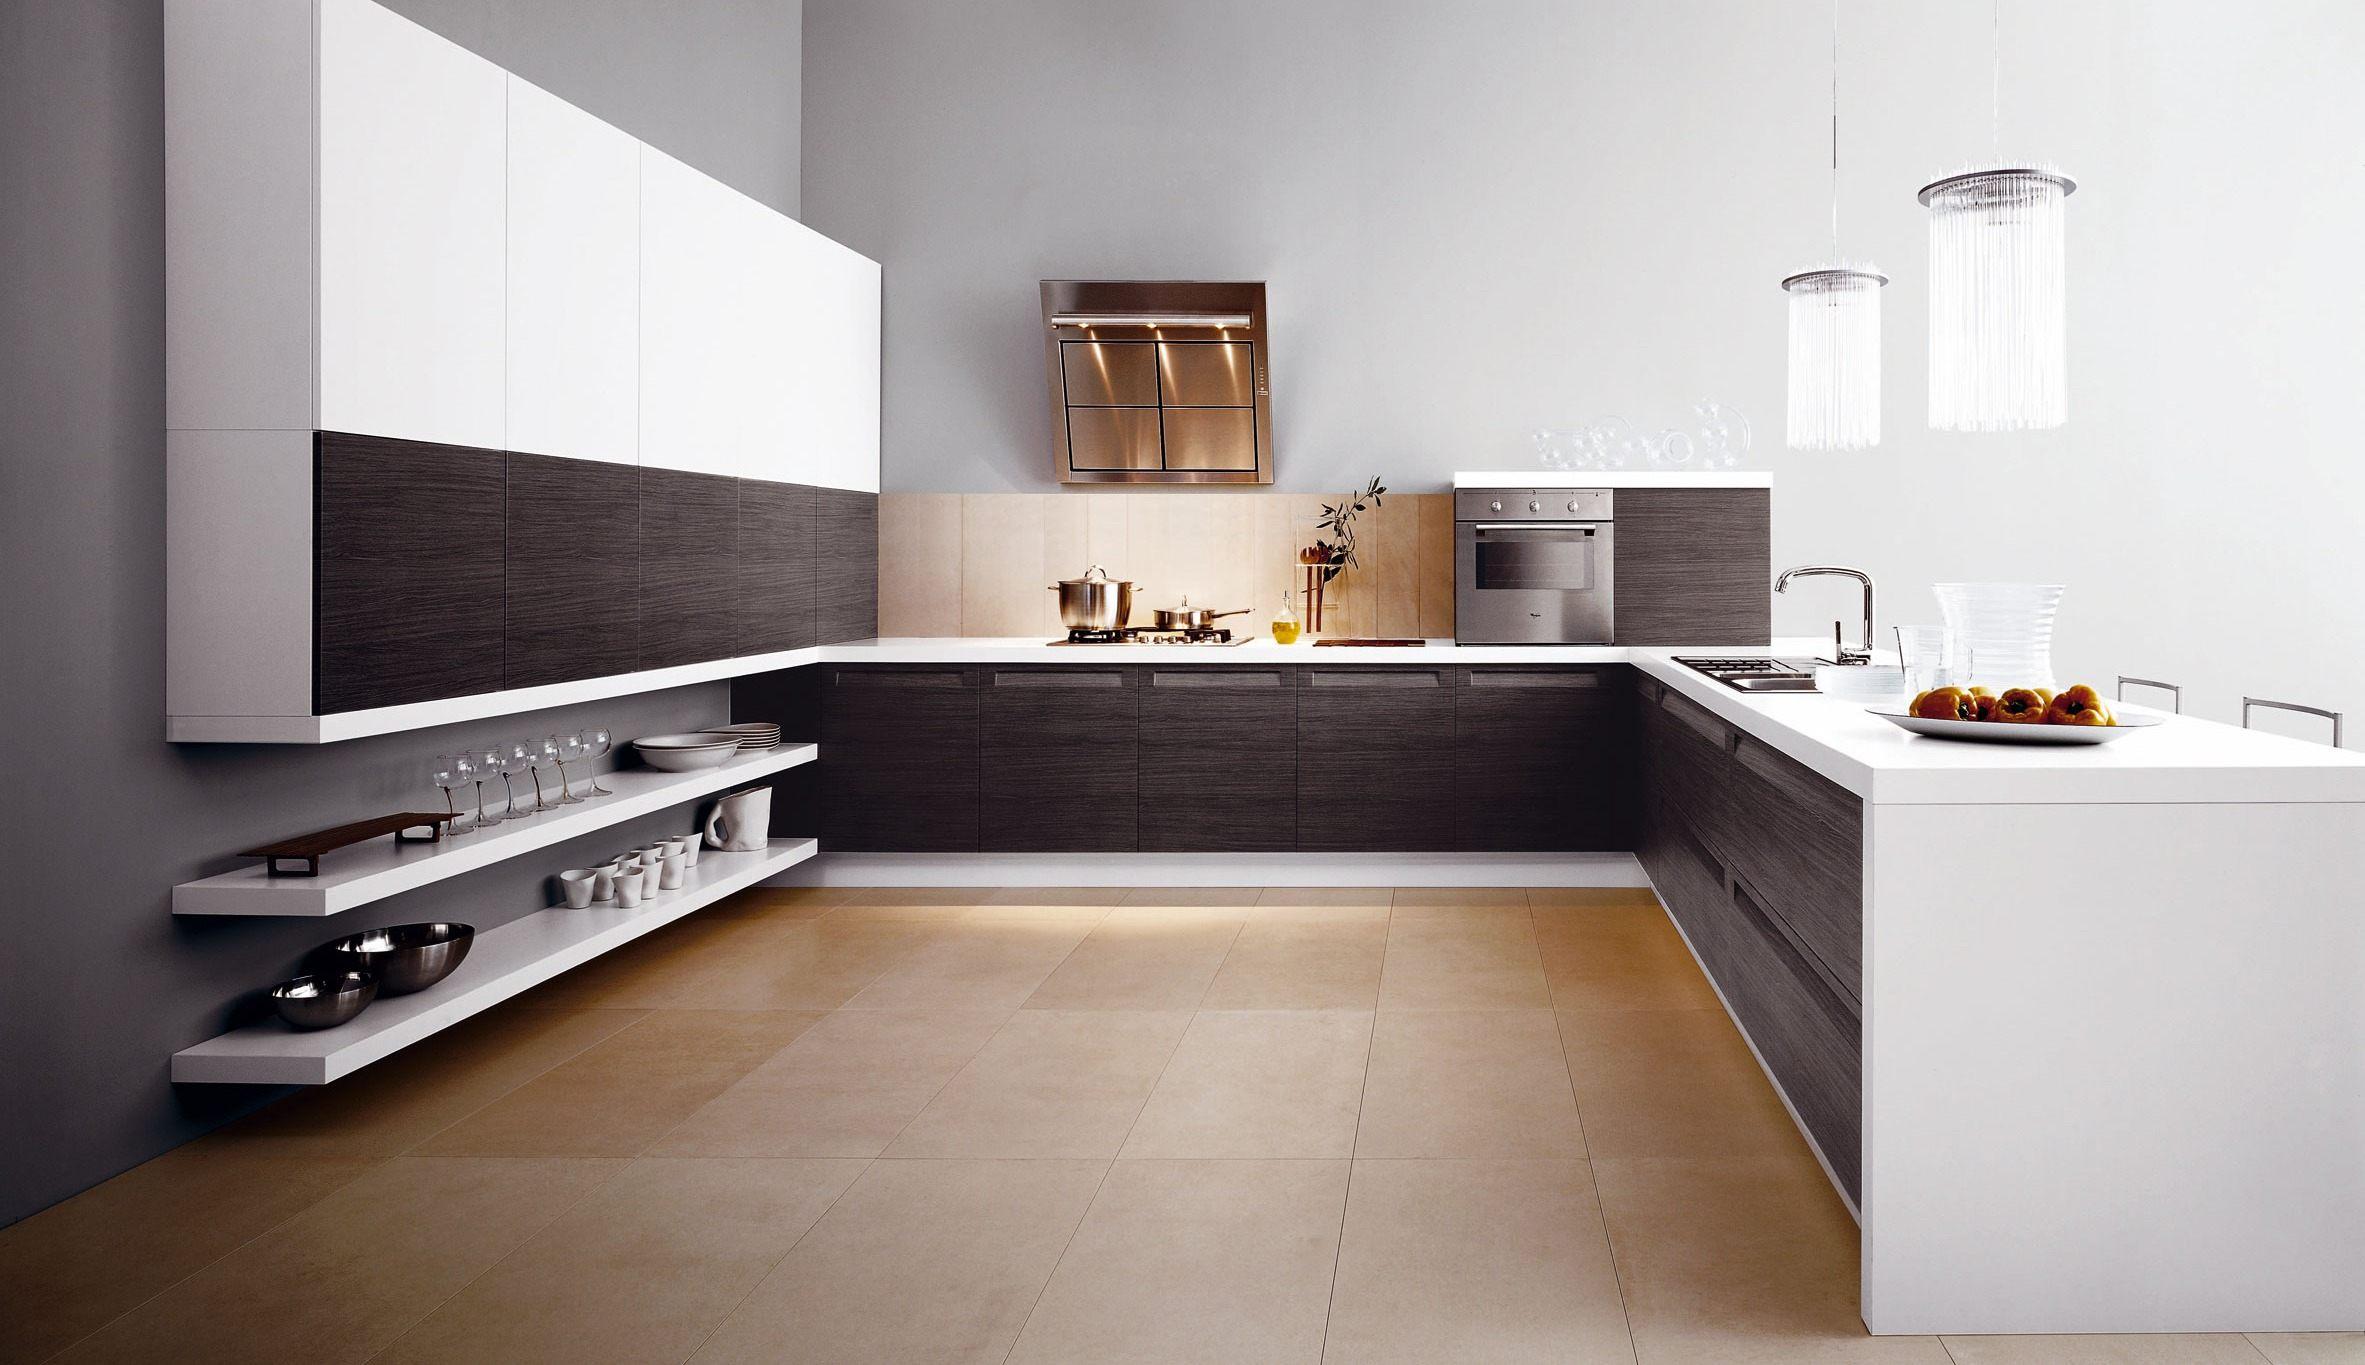 Contemporary Italian Kitchen Floors (Image 3 of 10)